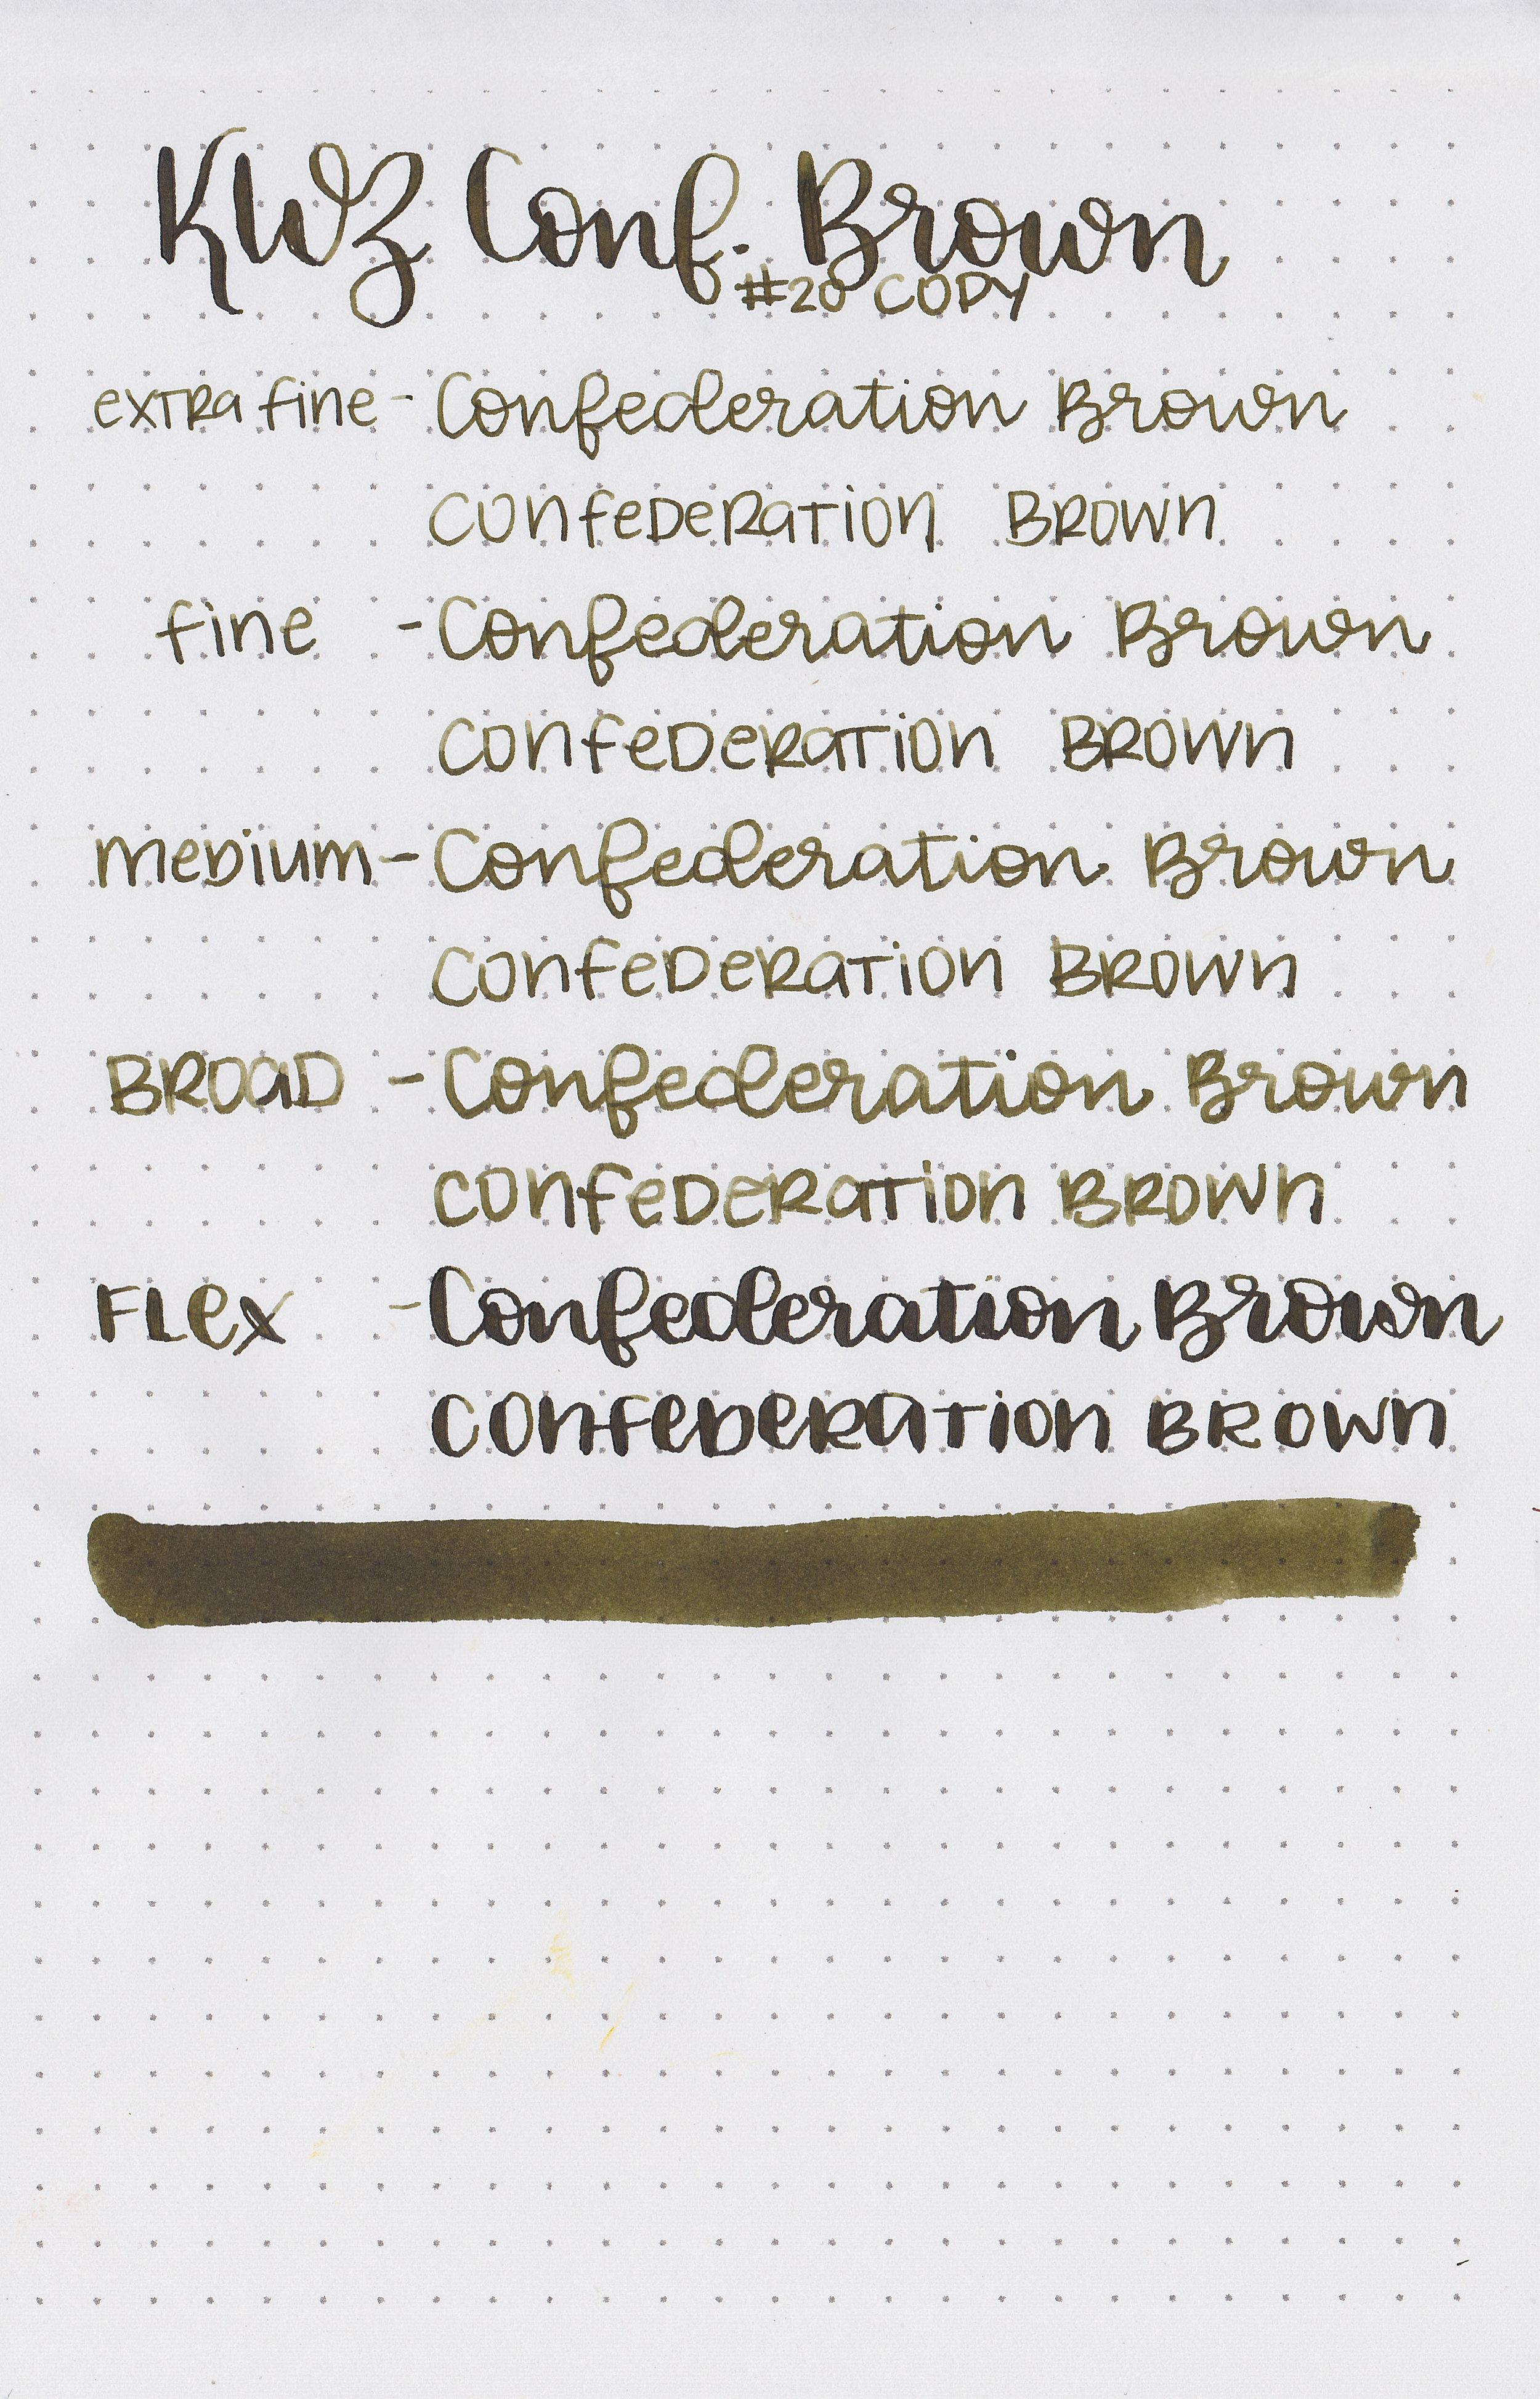 kwz-confederation-brown-10.jpg